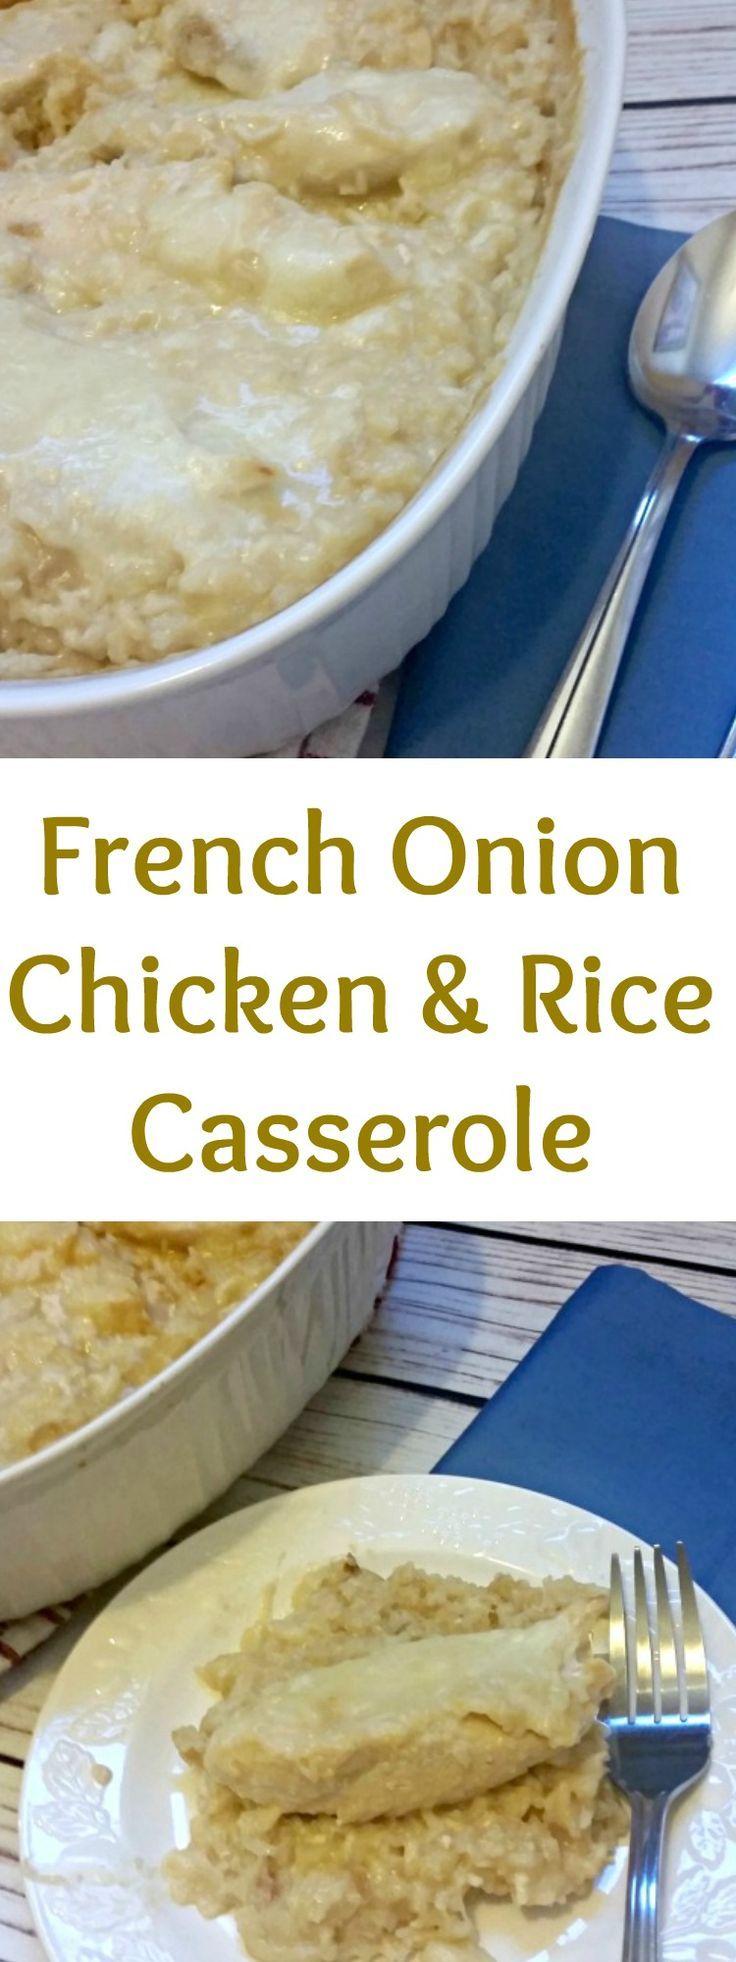 French onions chicken recipe